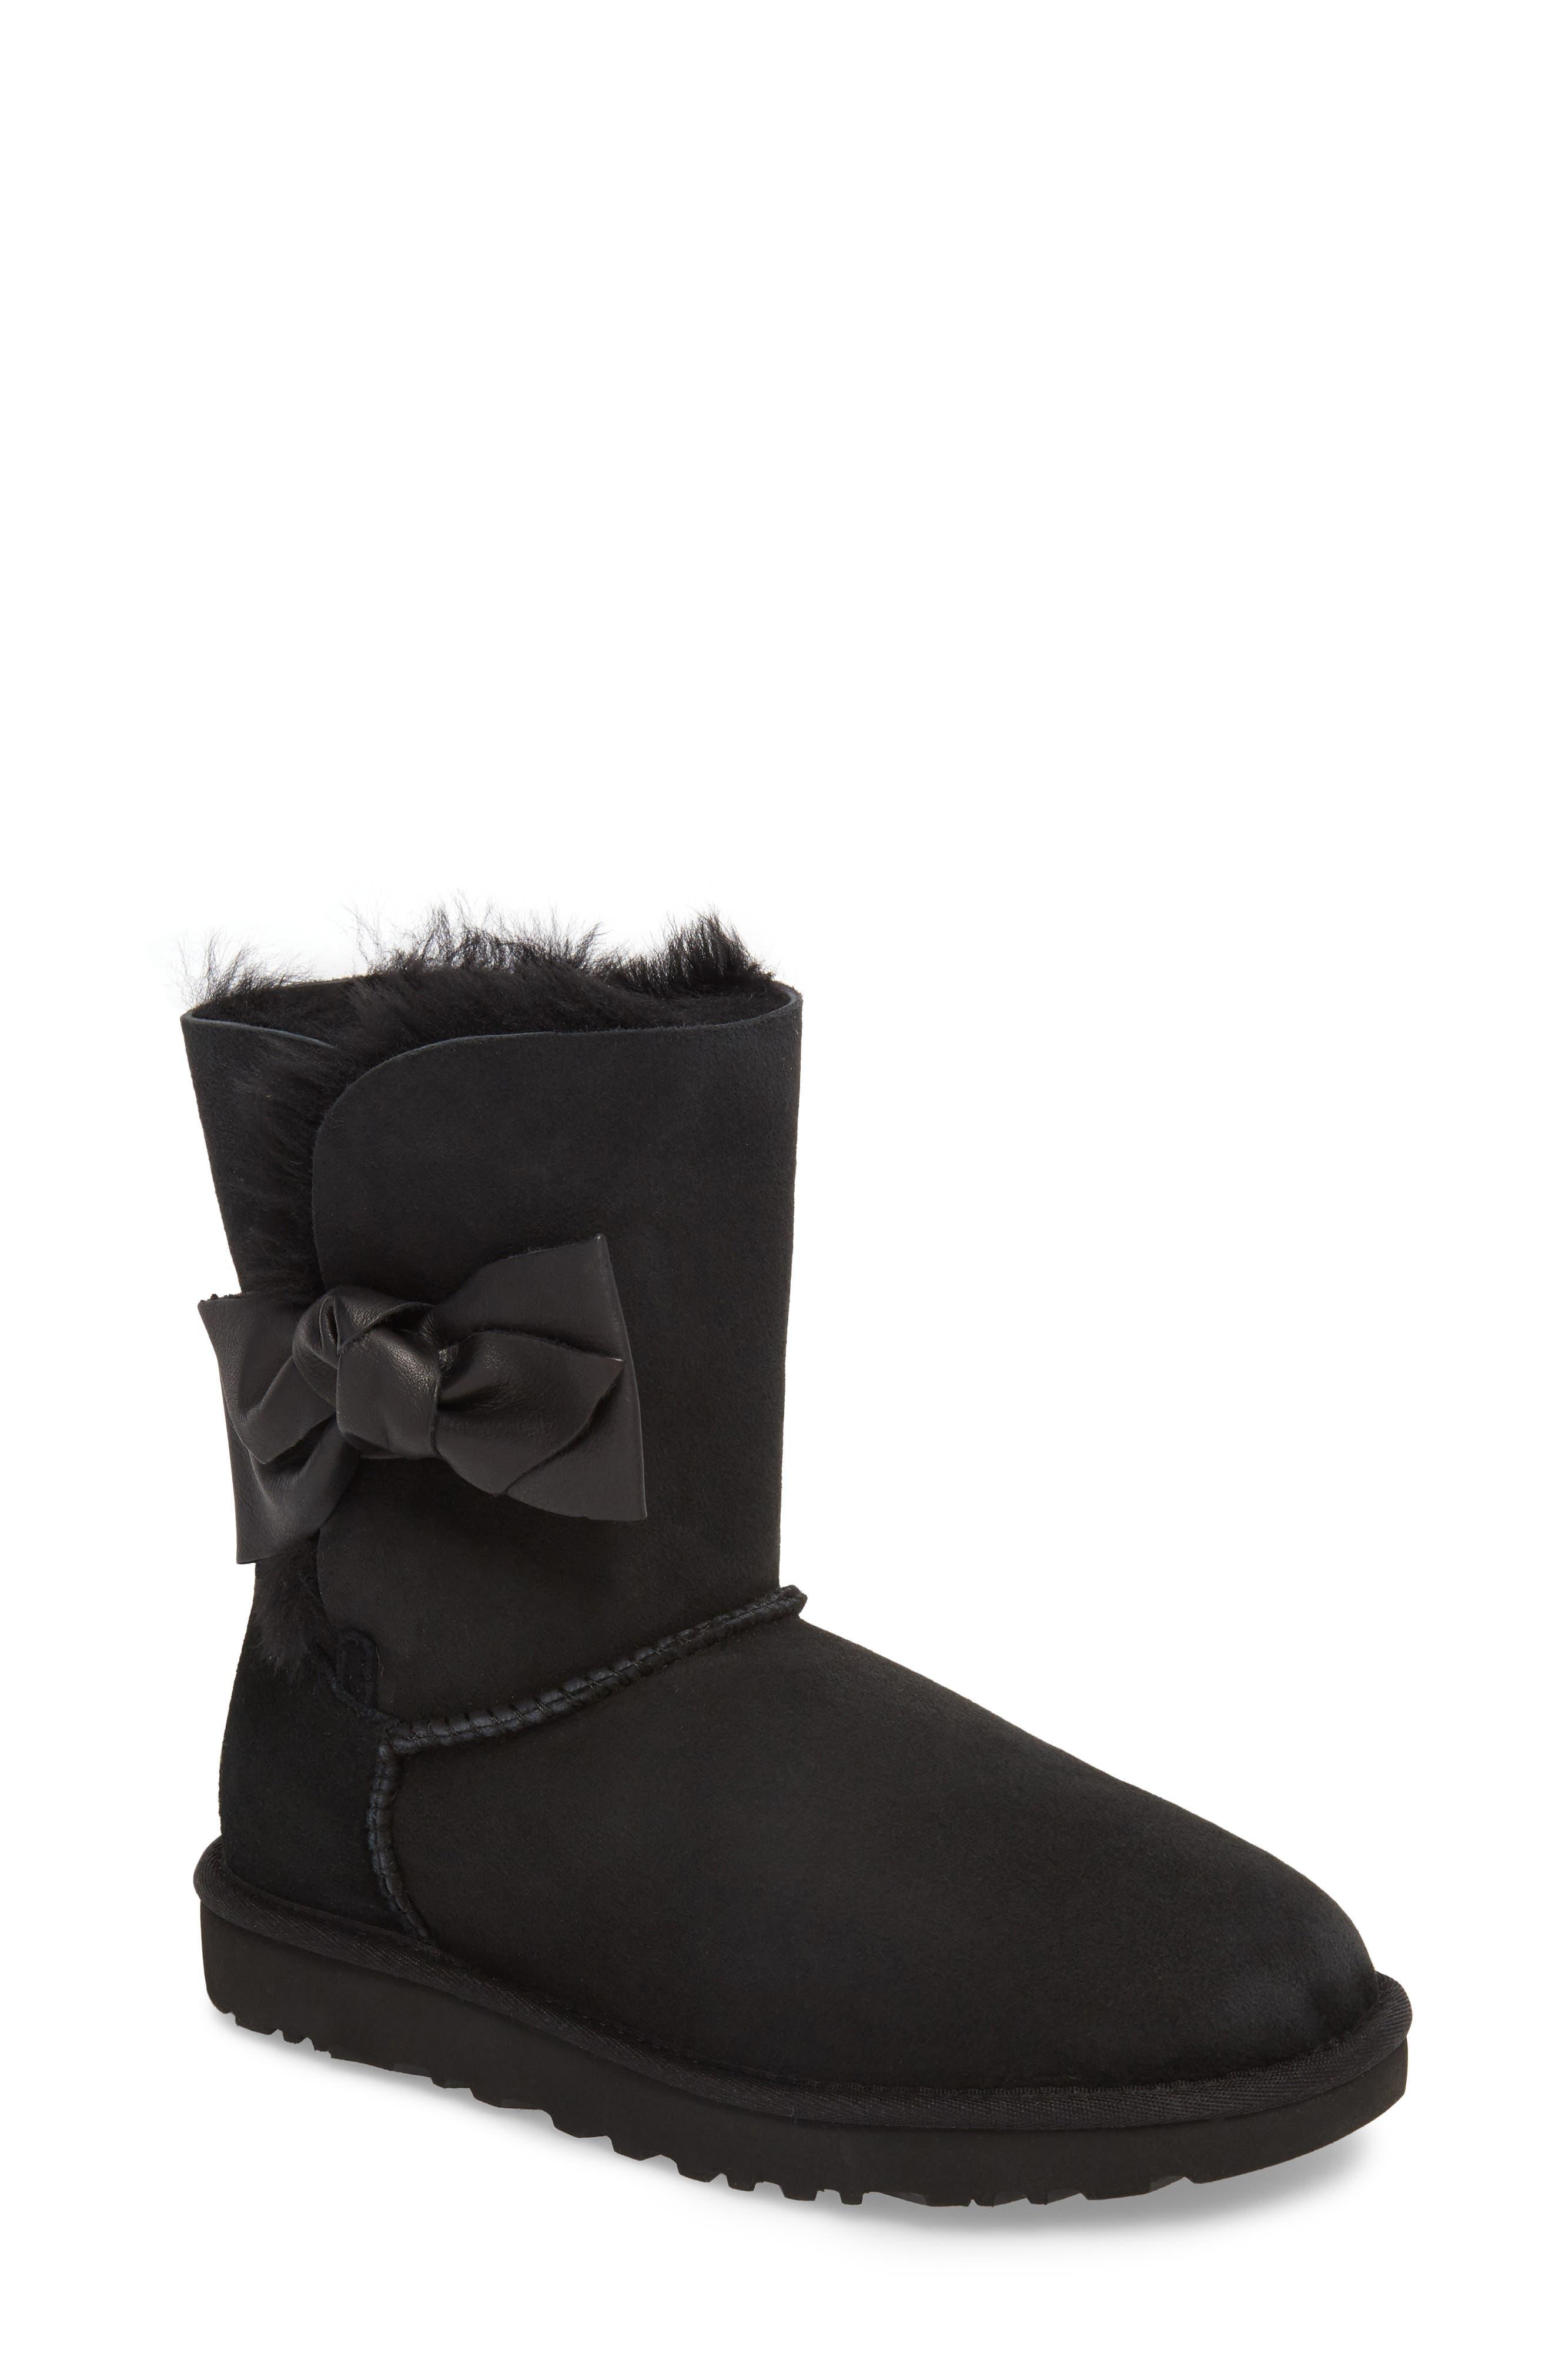 Ugg Daelynn Boot, Black